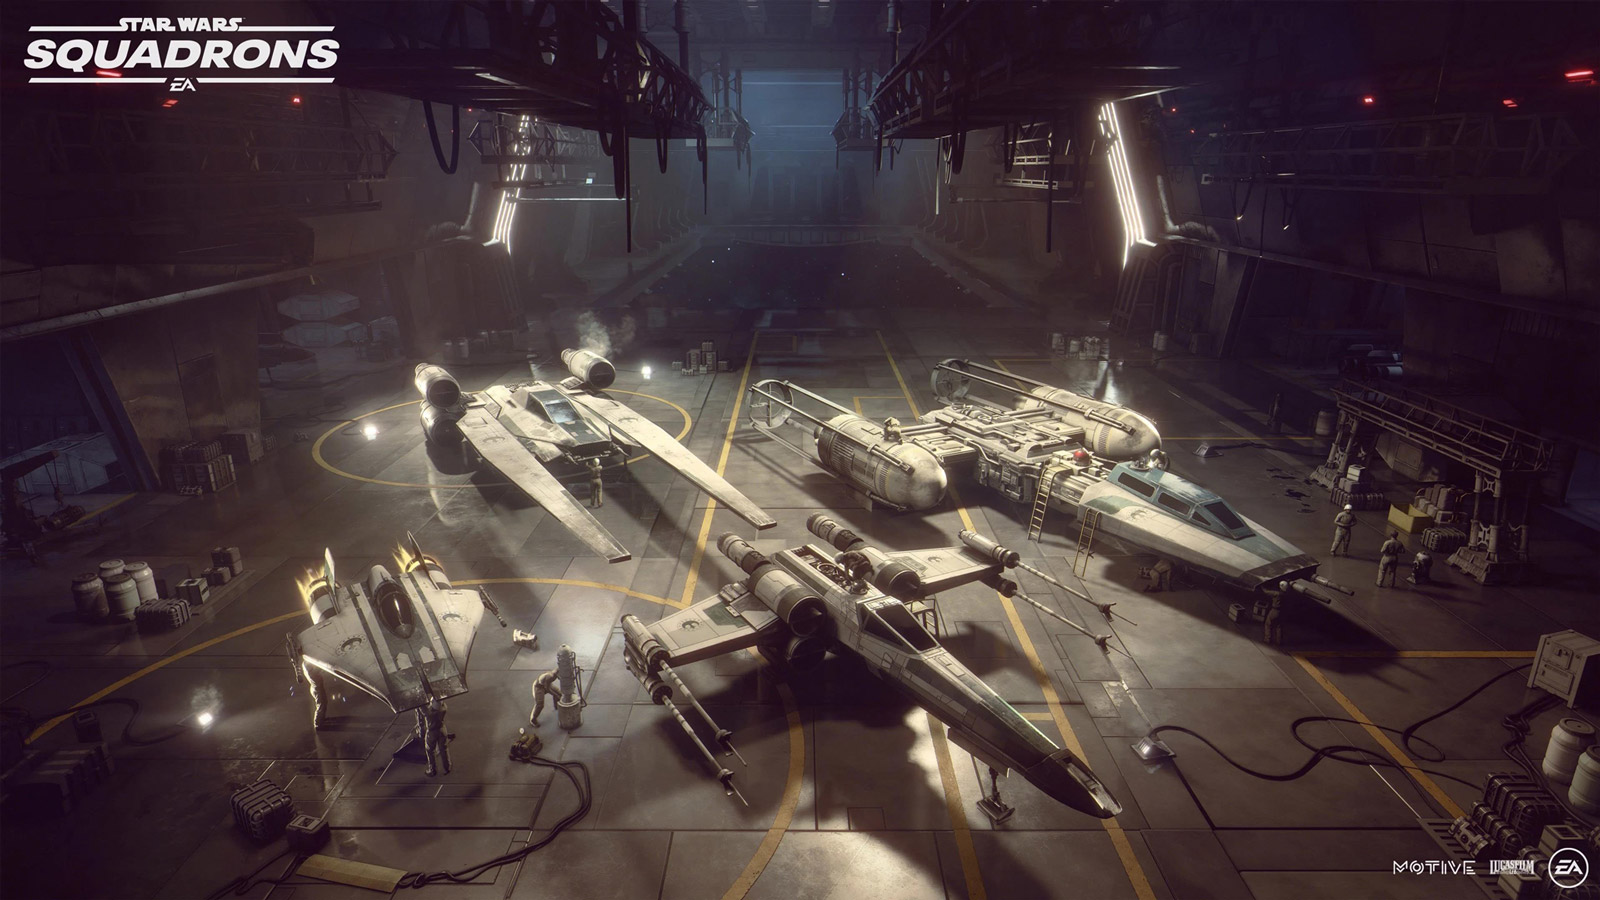 Free Star Wars: Squadrons Wallpaper in 1600x900